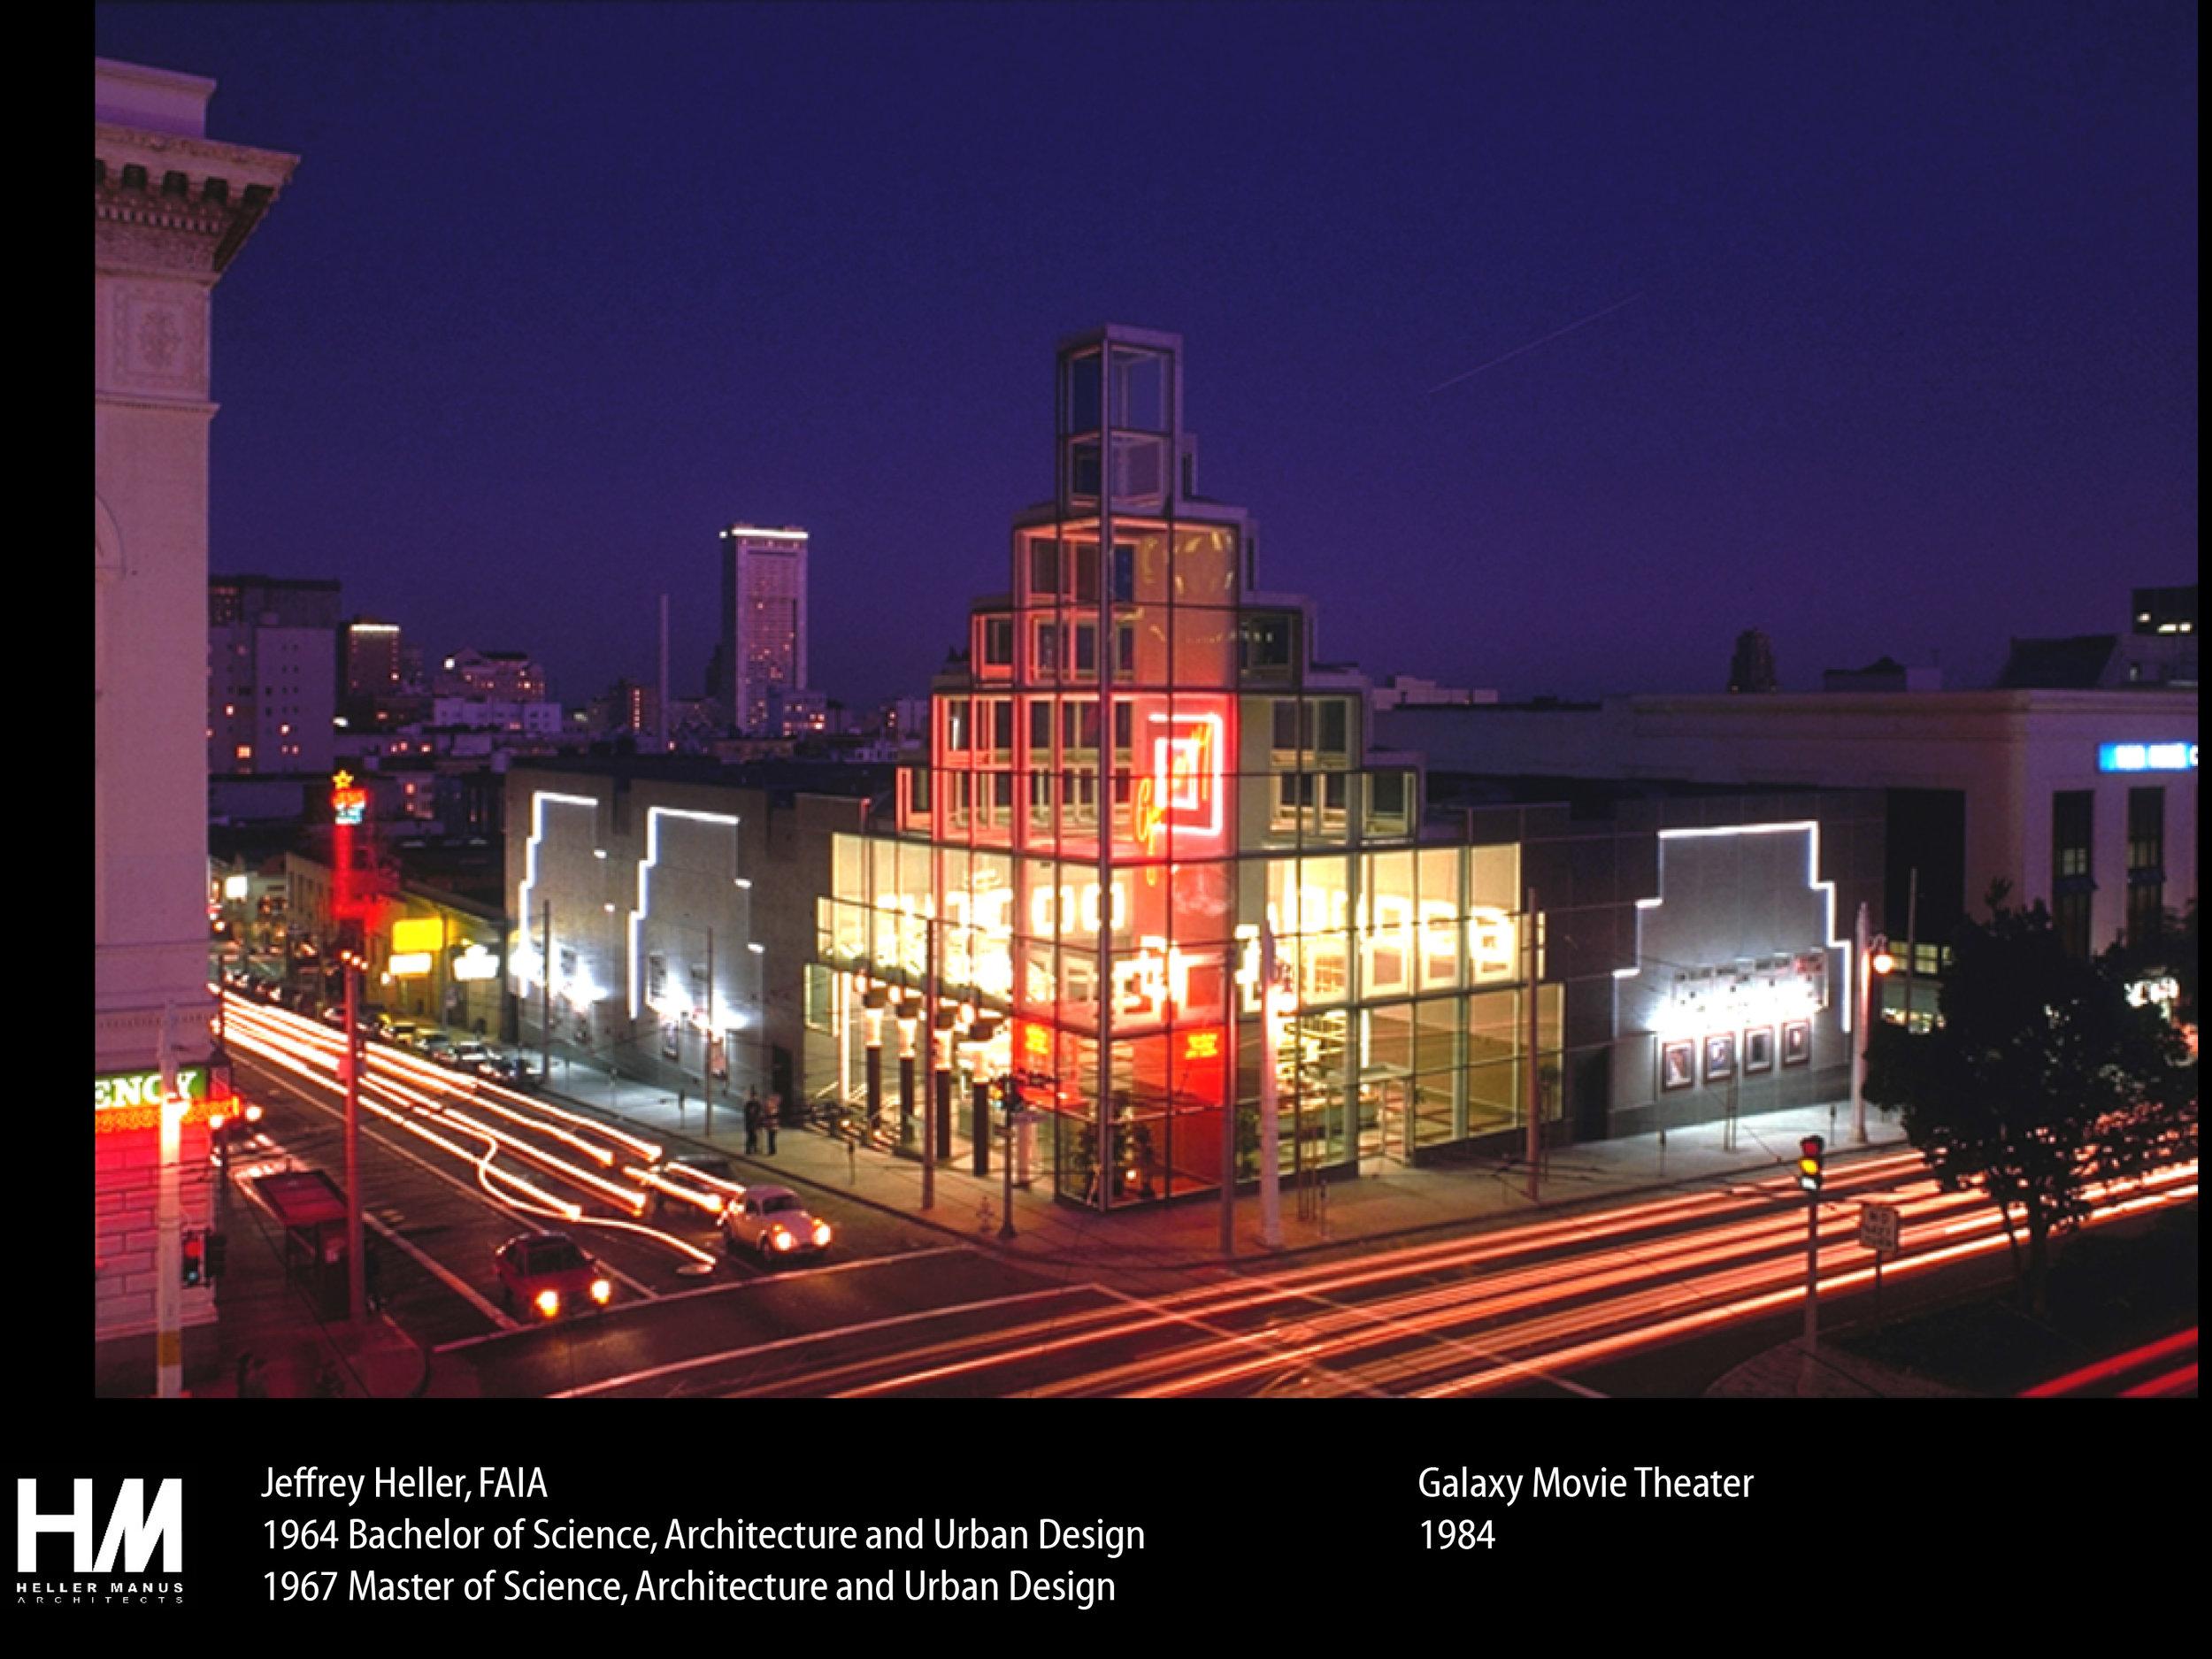 MIT ARCHITECTURE 150 SAN FRANCISCO SLIDESHOW-72 copy.jpg